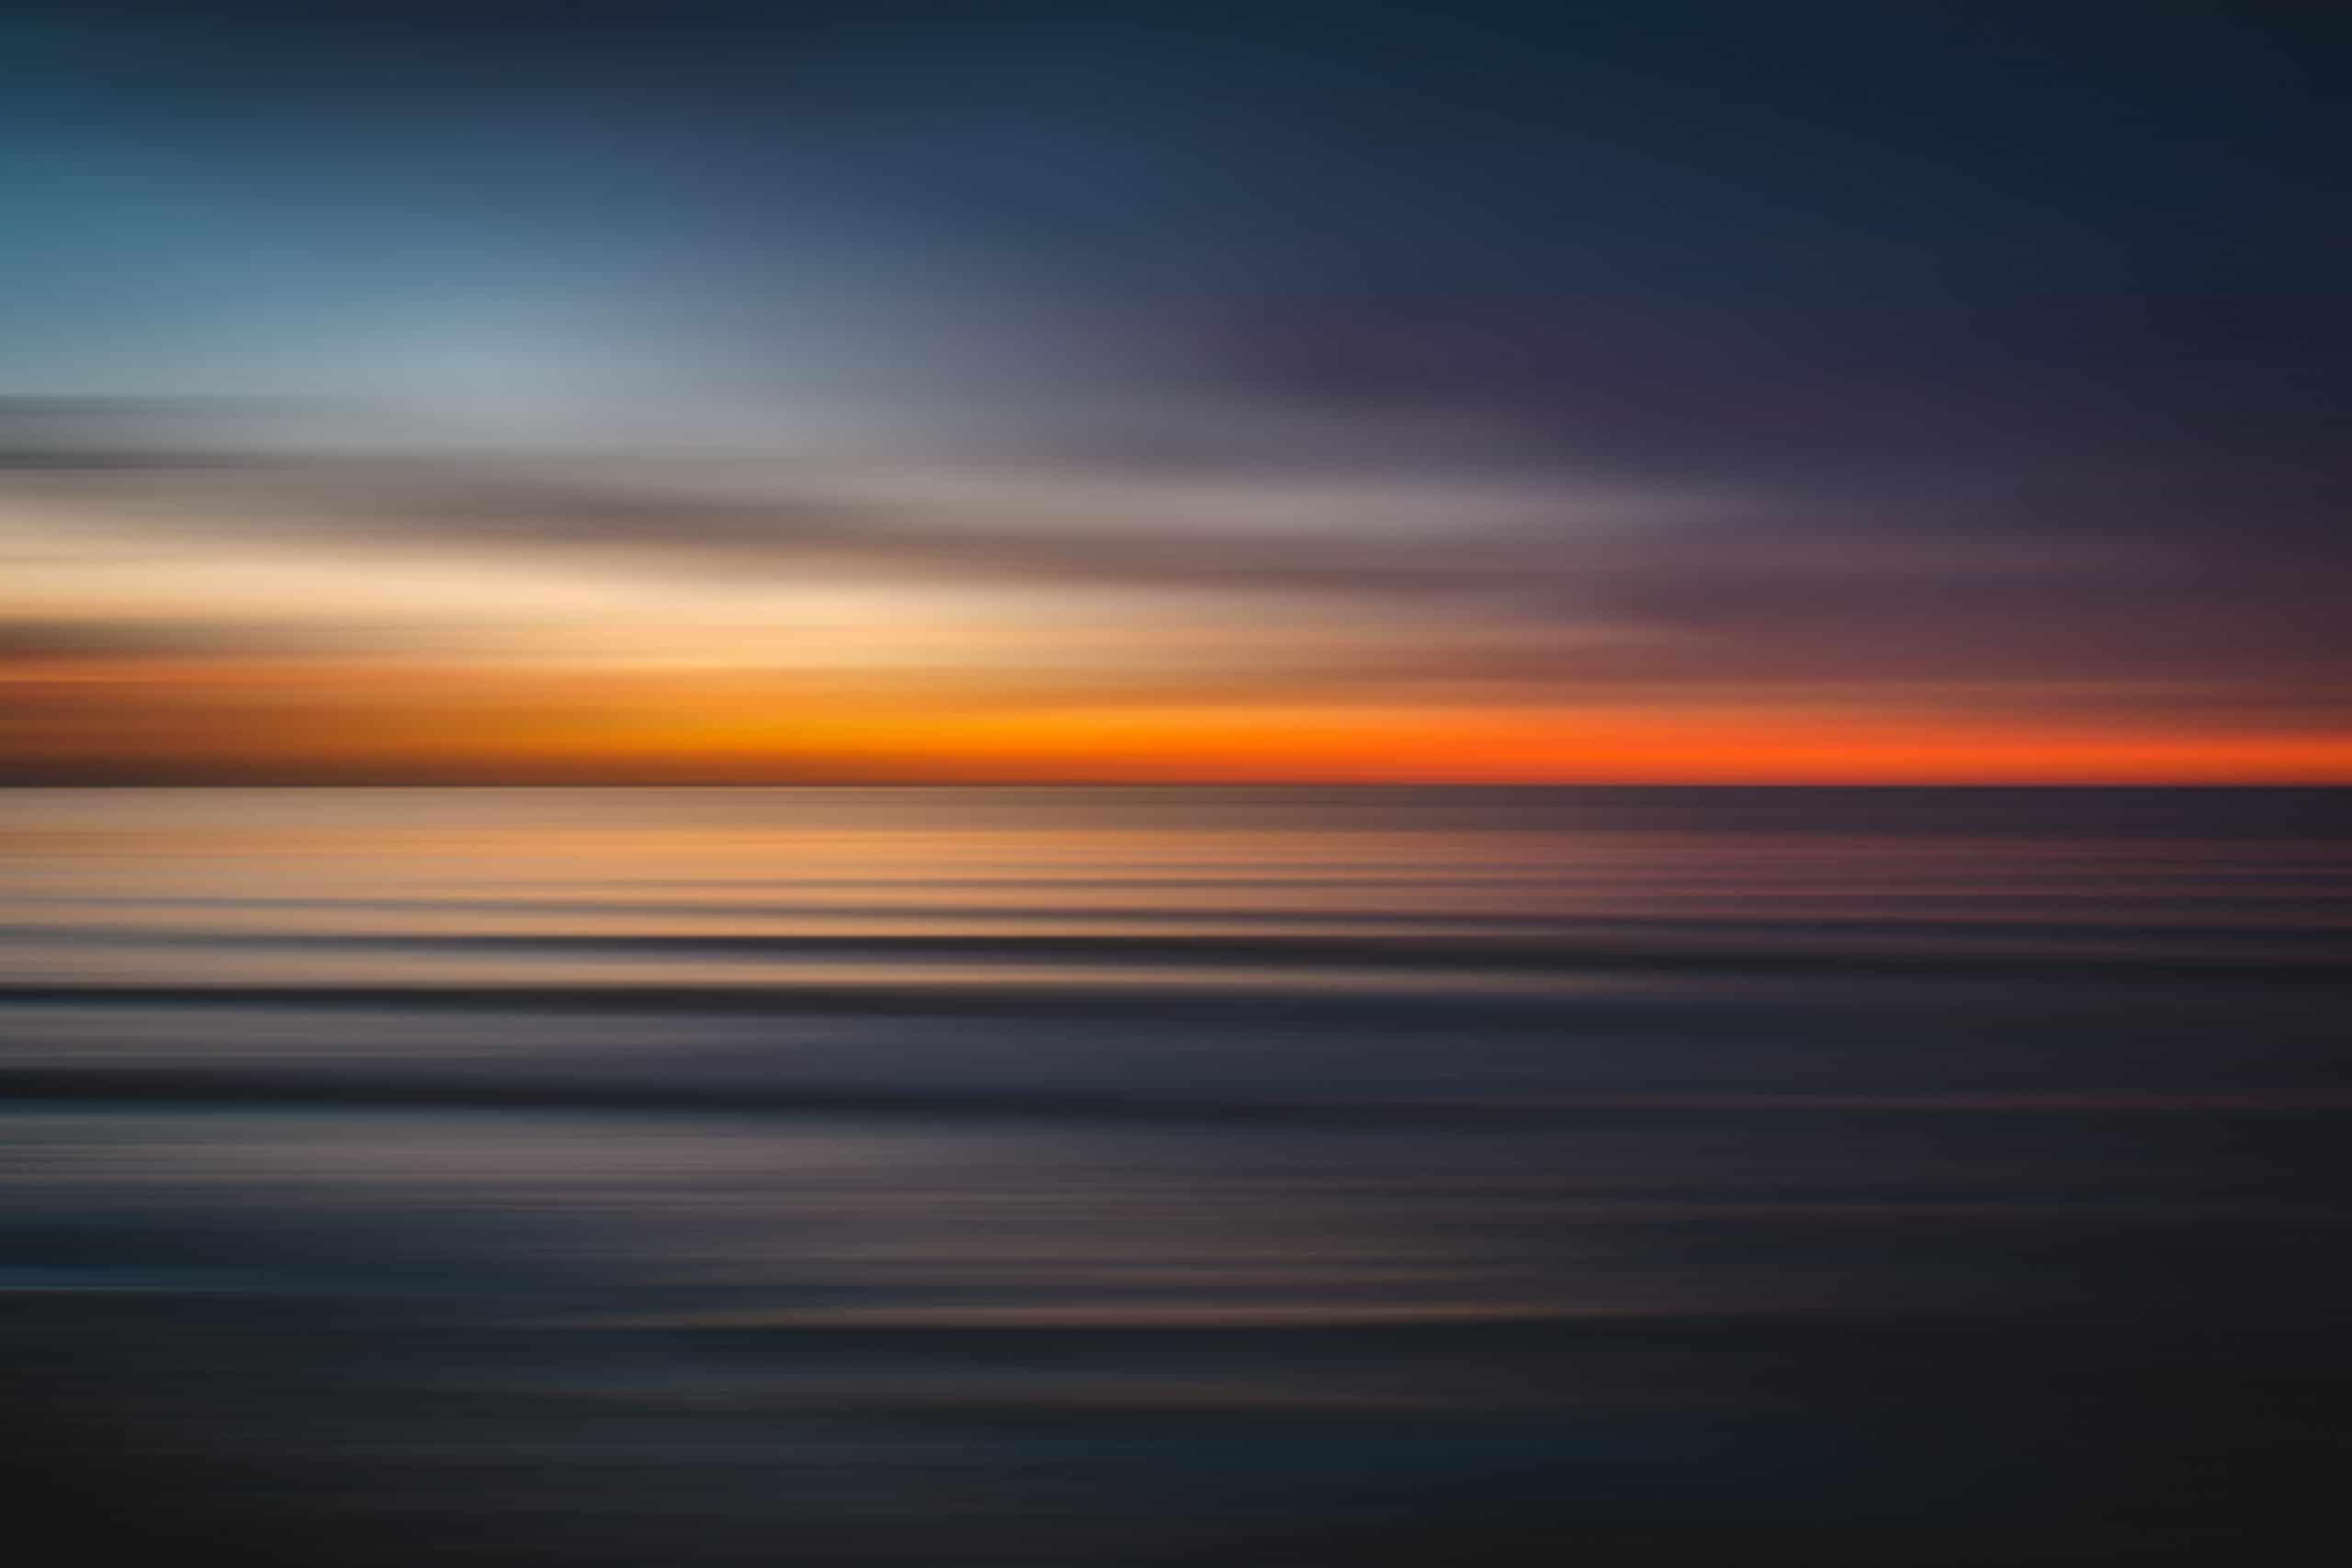 A New Horizon